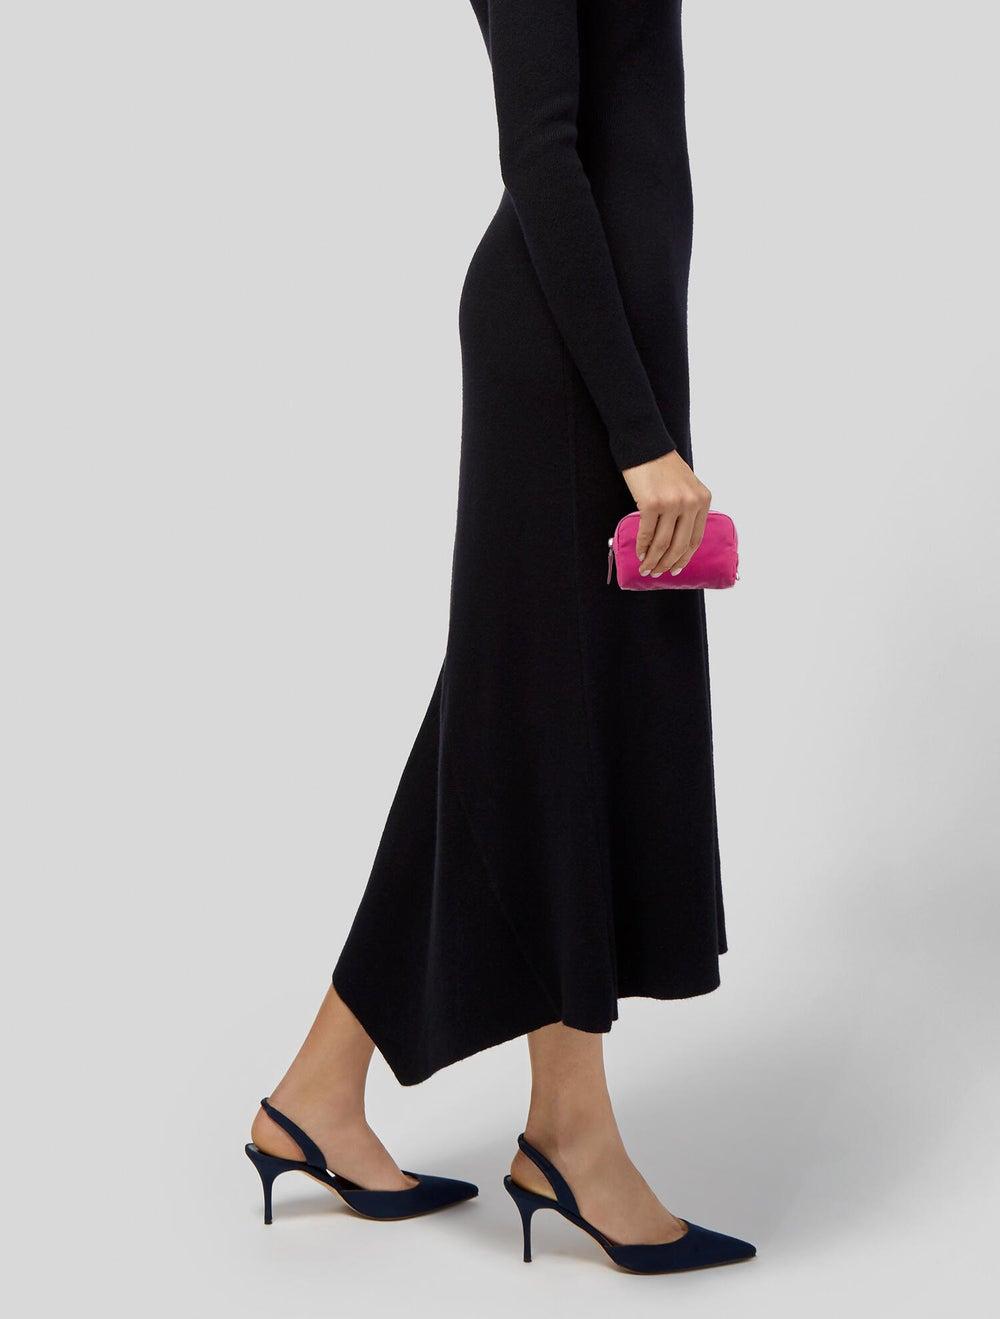 Prada Tessuto Cosmetic Bag Pink - image 2